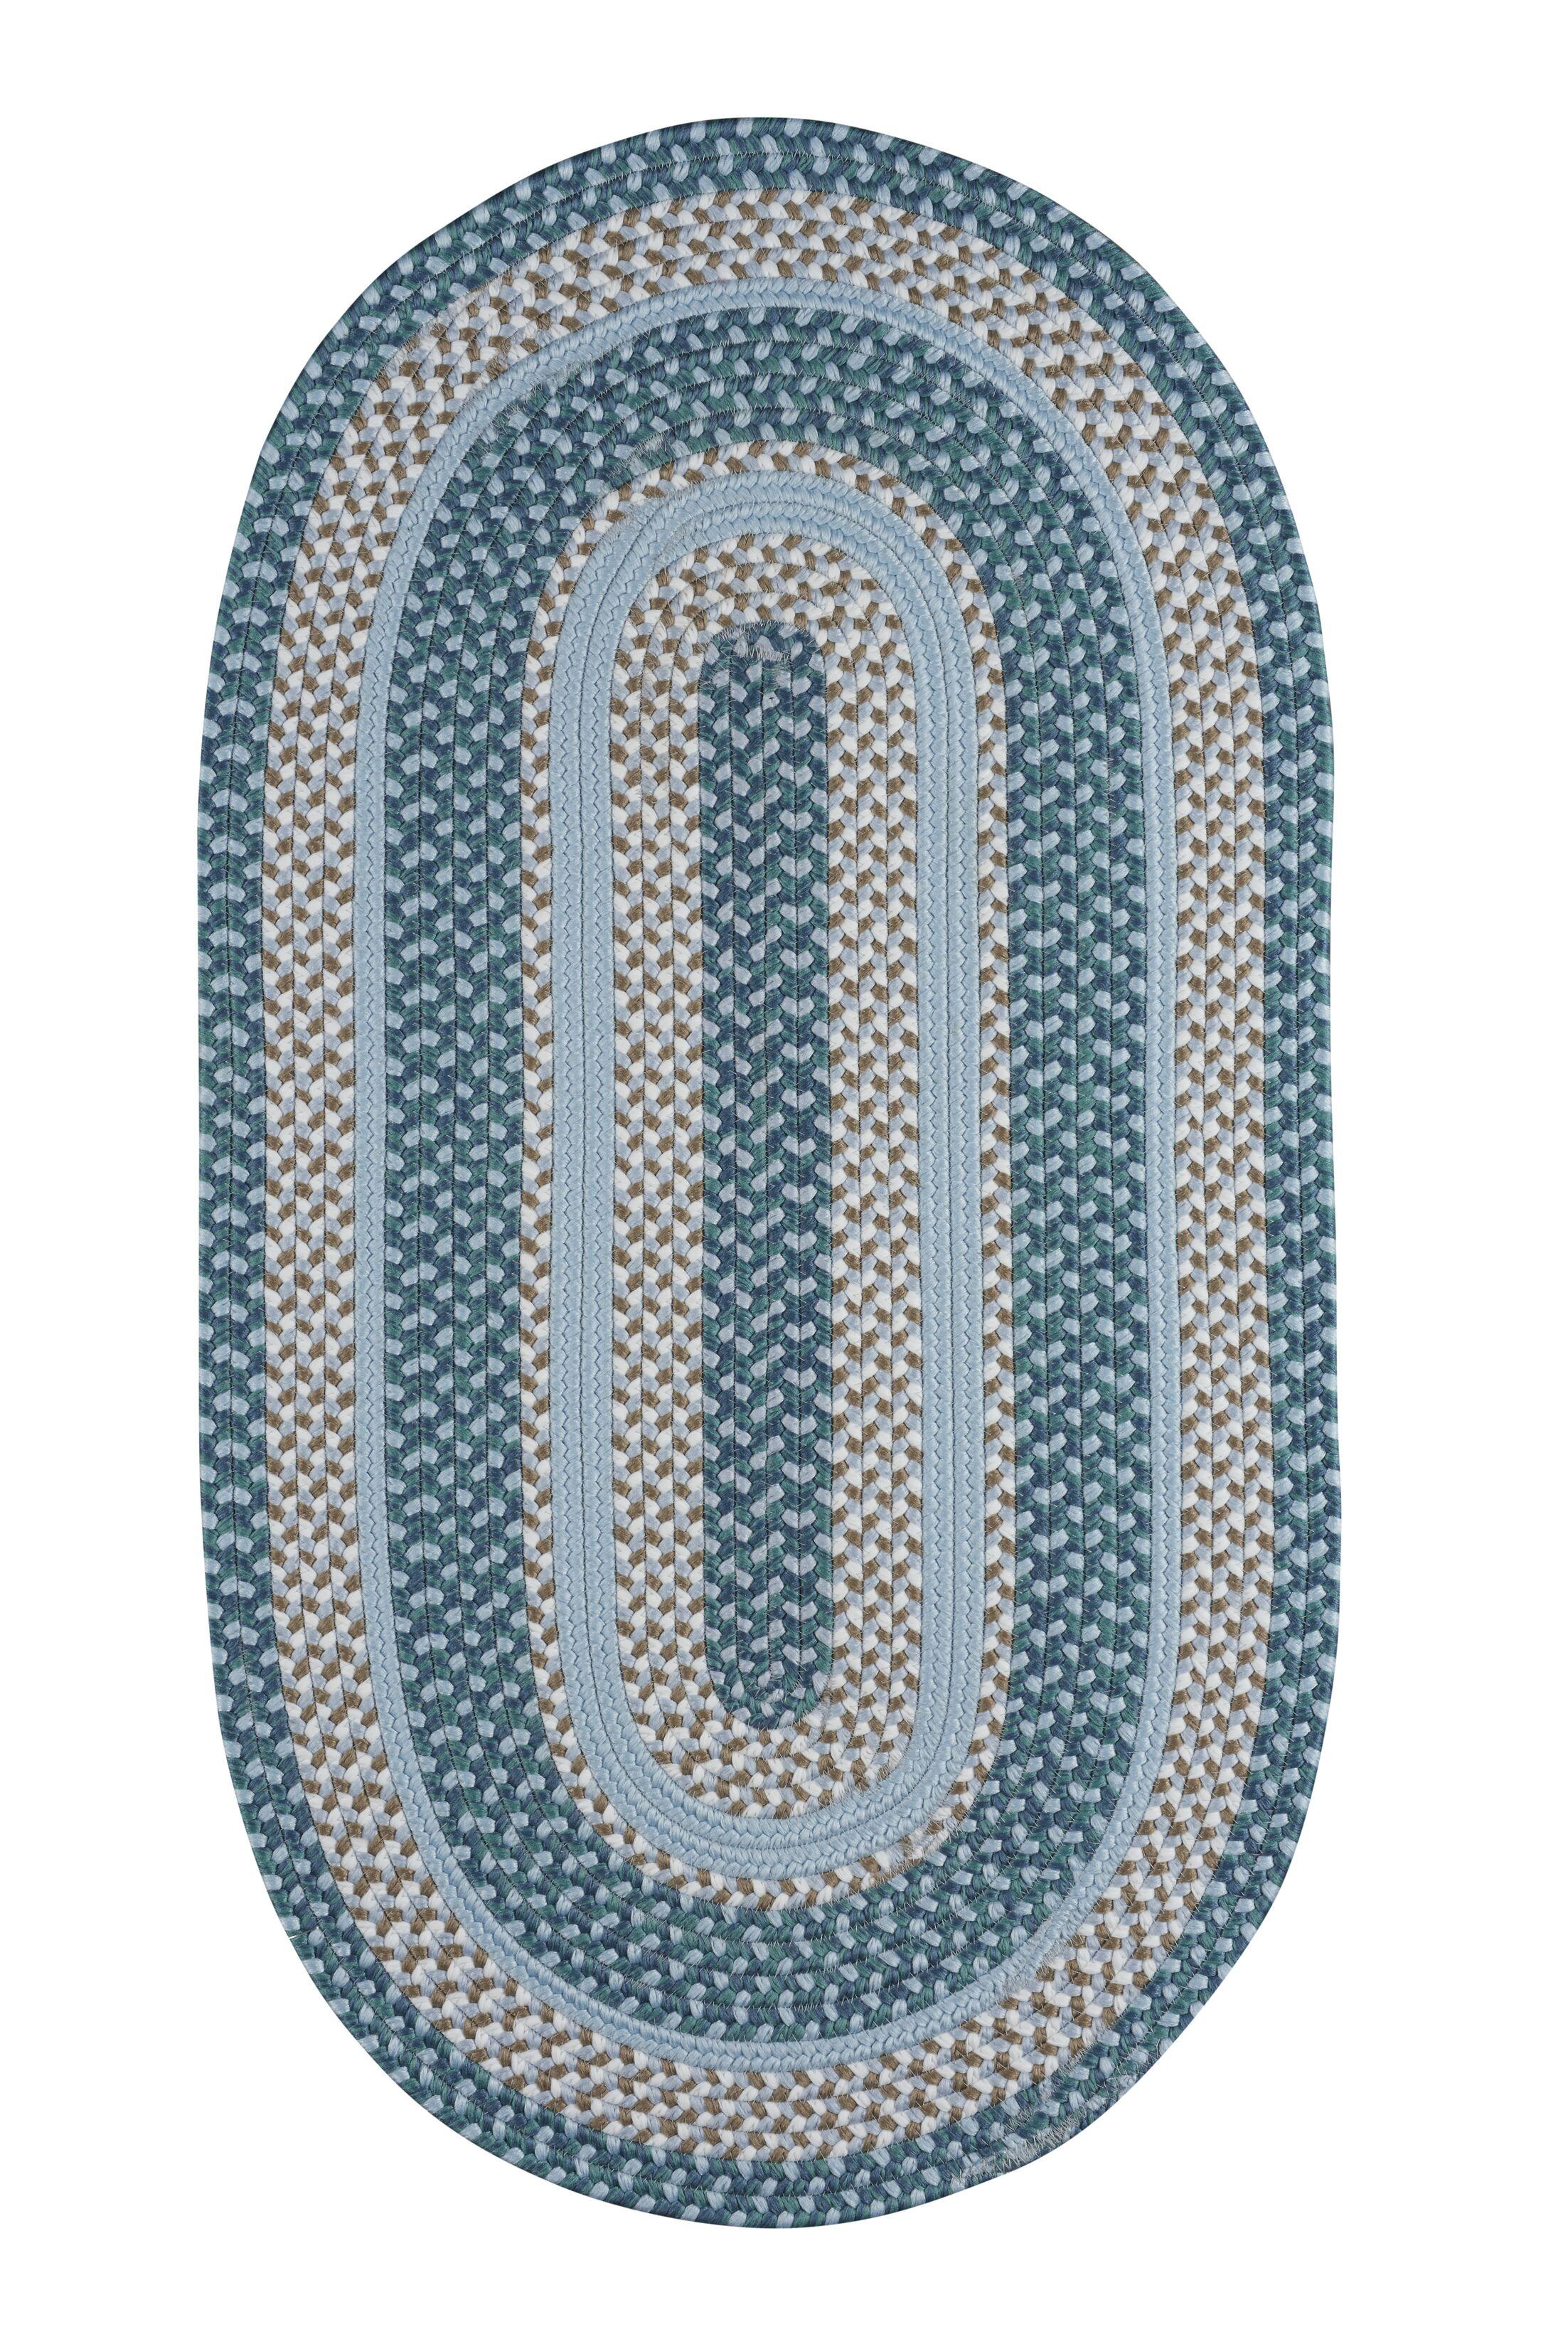 Wieland Hand-Braided Aqua Area Rug Rug Size: Rectangle 5' x 8'